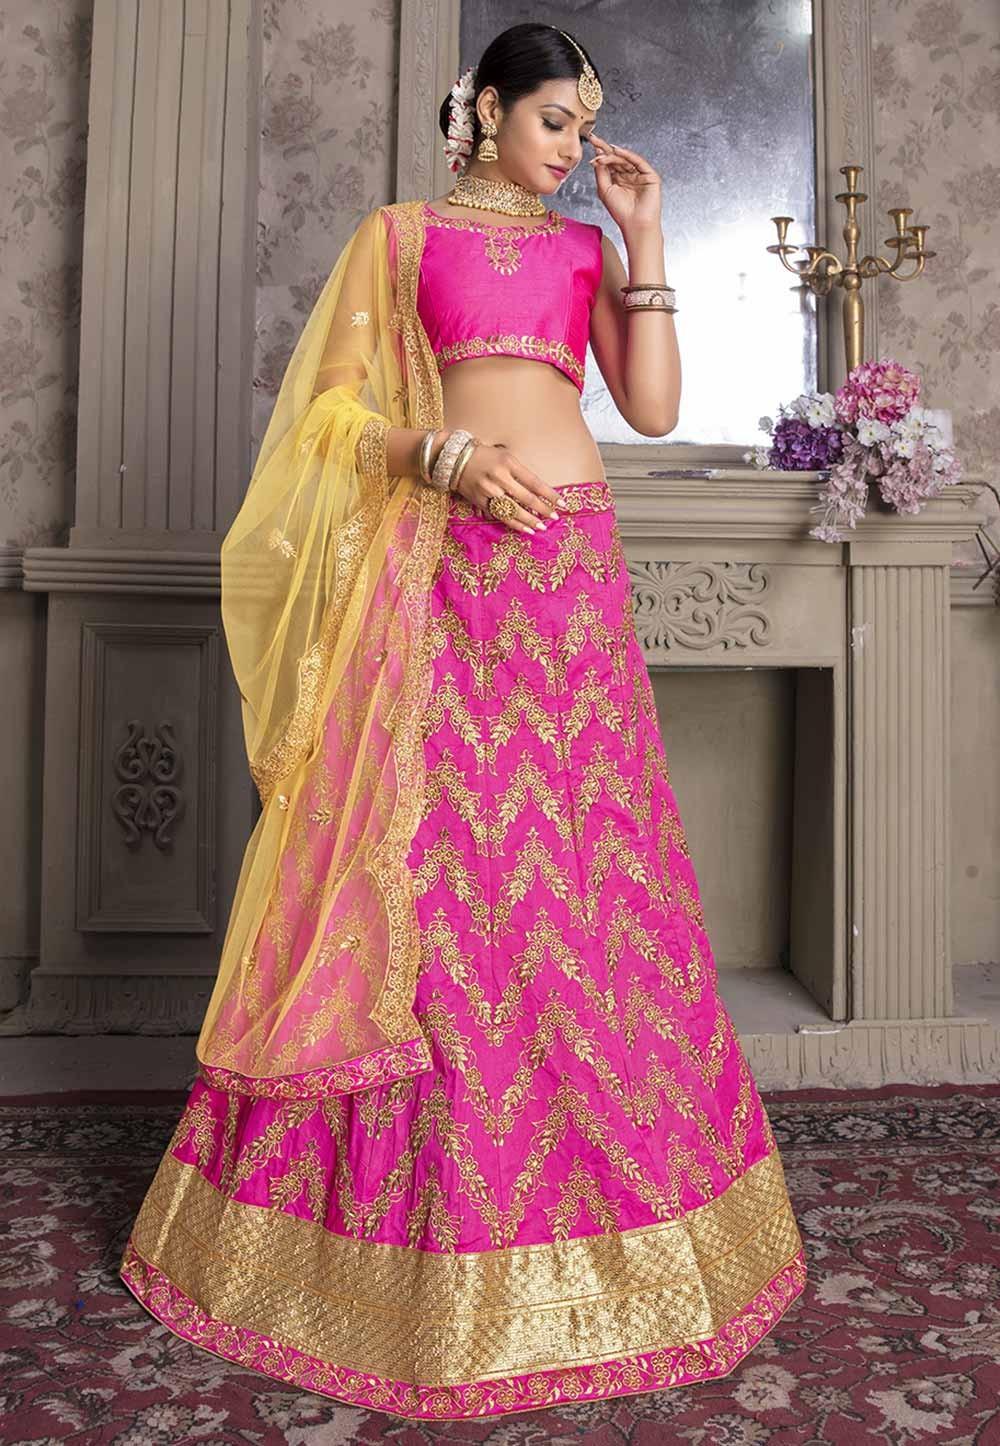 Rani Pink Colour Wedding Lehenga Choli.